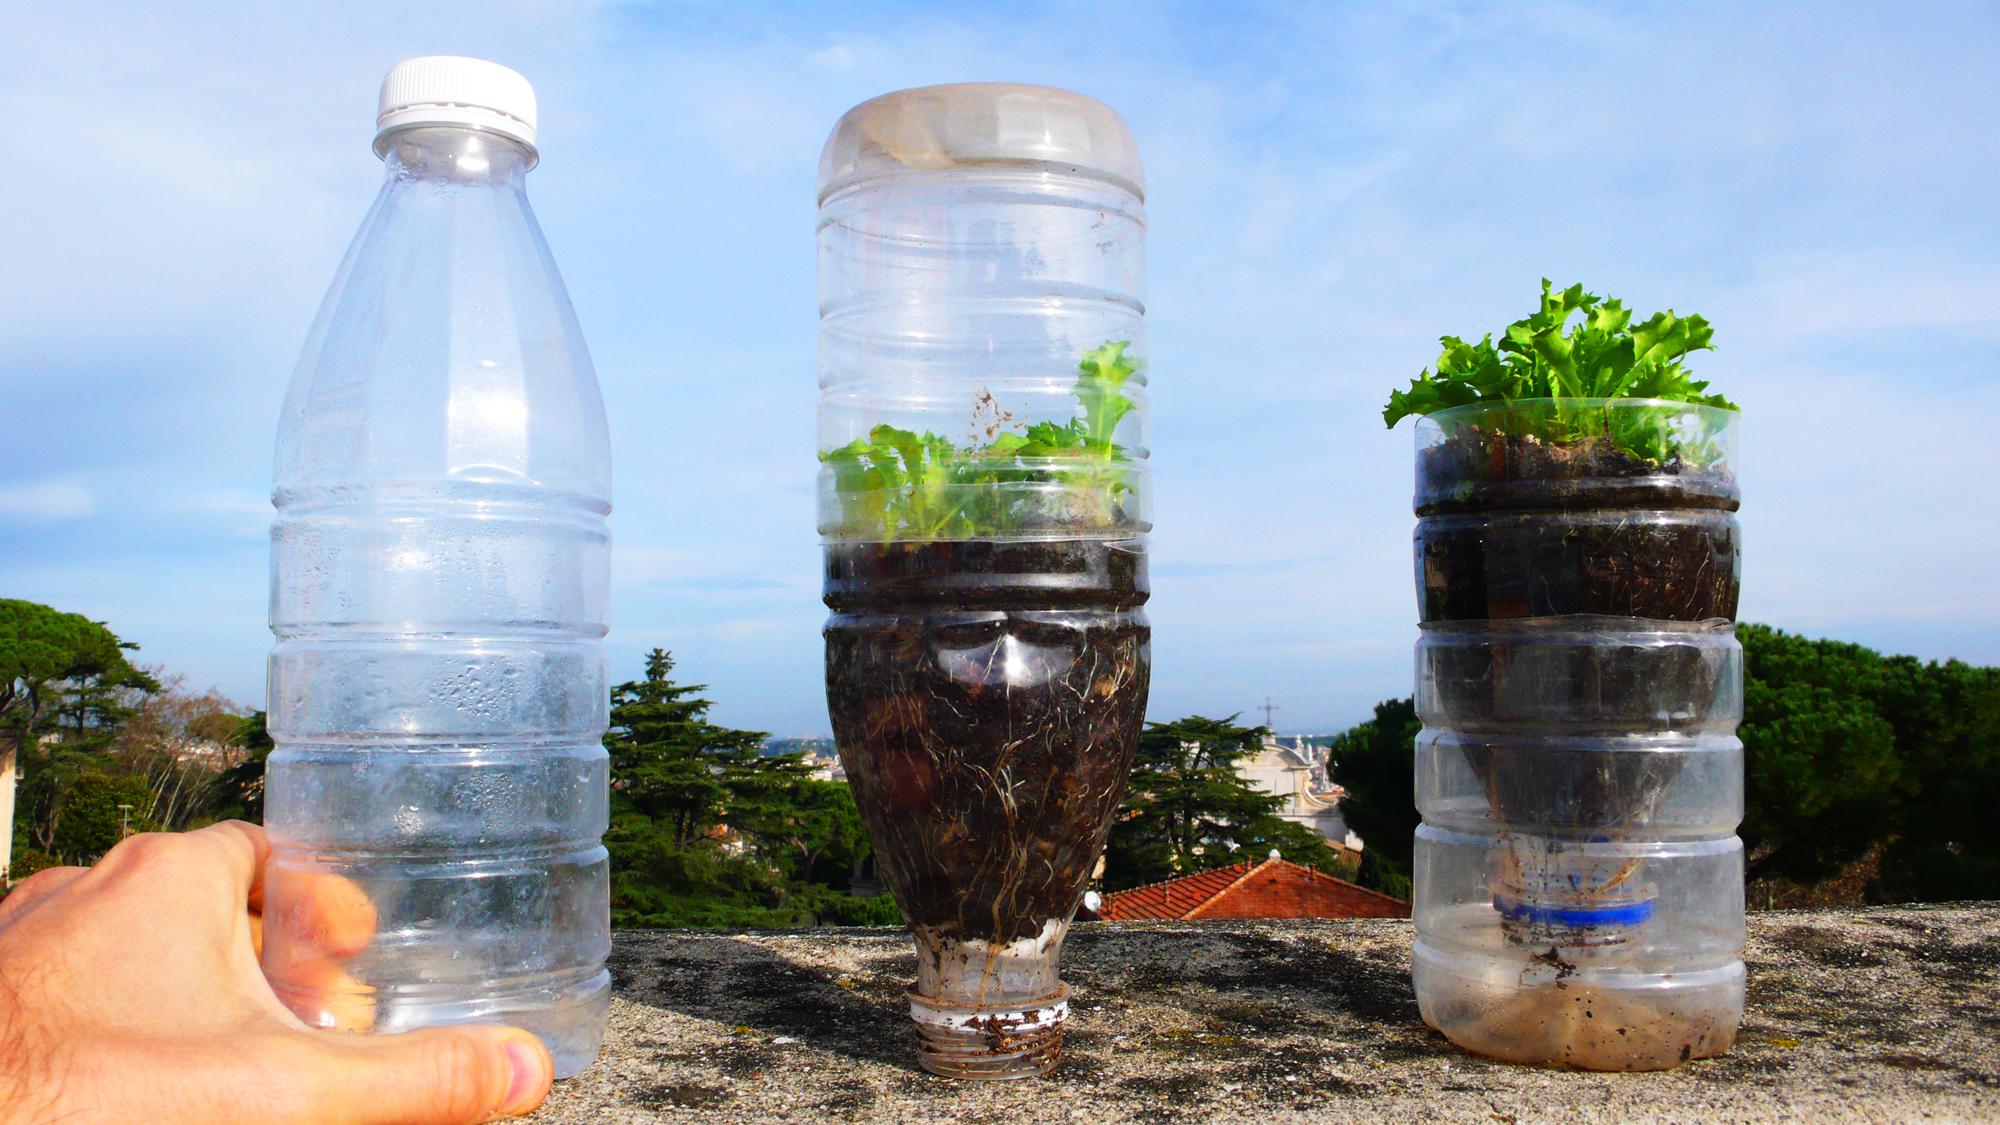 Муравей из пластиковой бутылки, бабочка-коробочка - LiveInternet 97